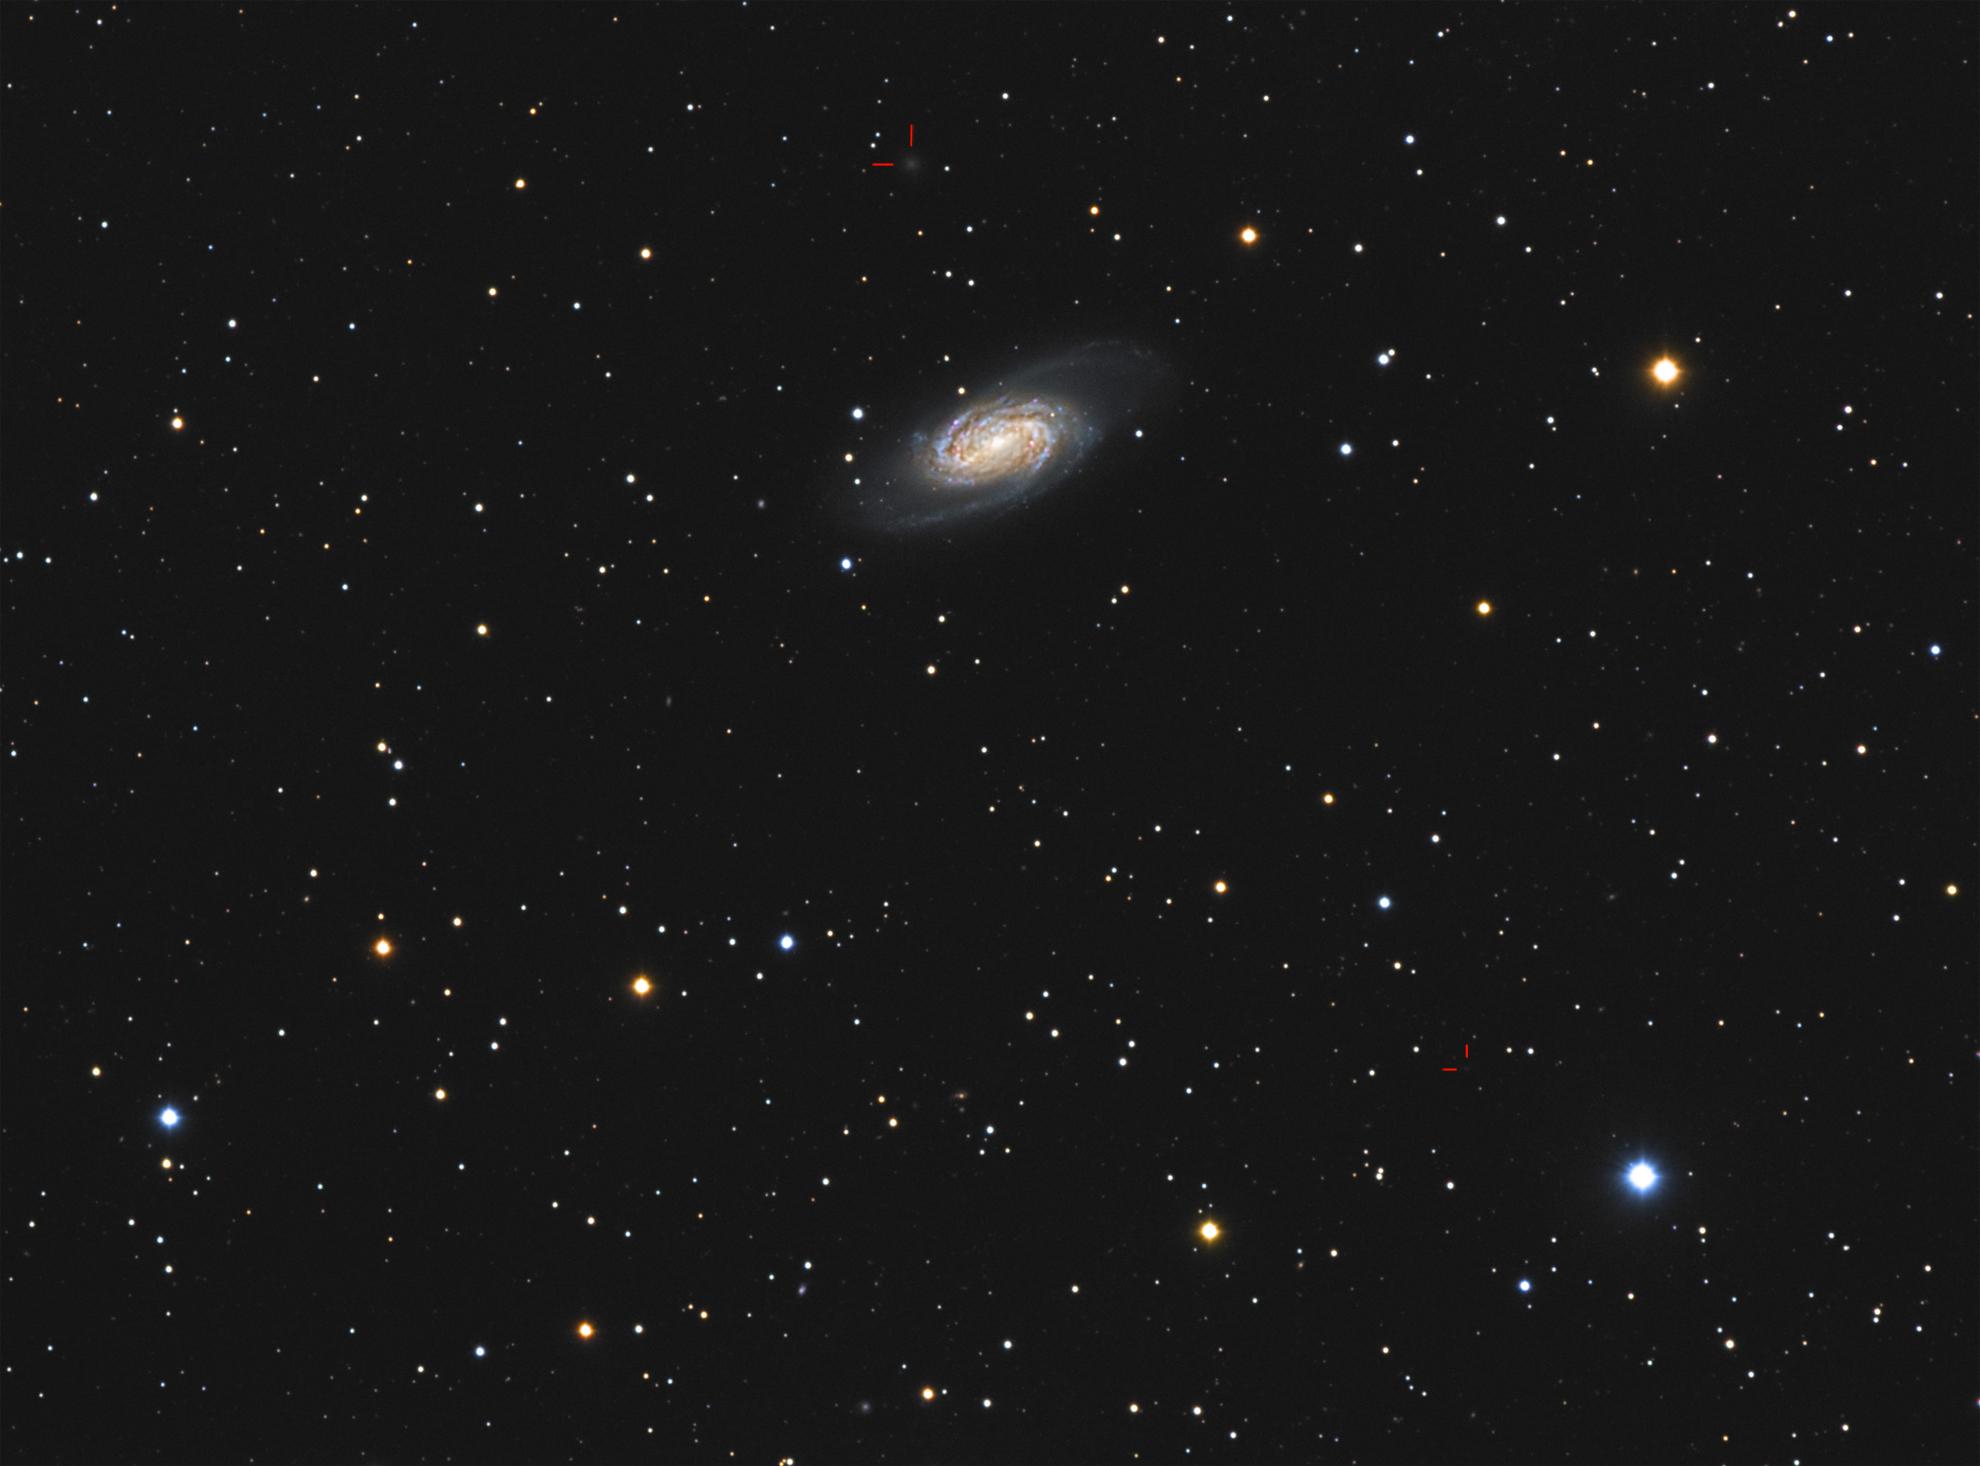 NGC2903-LRGB-20150309-2026-sx-480s-TTK-label.JPG